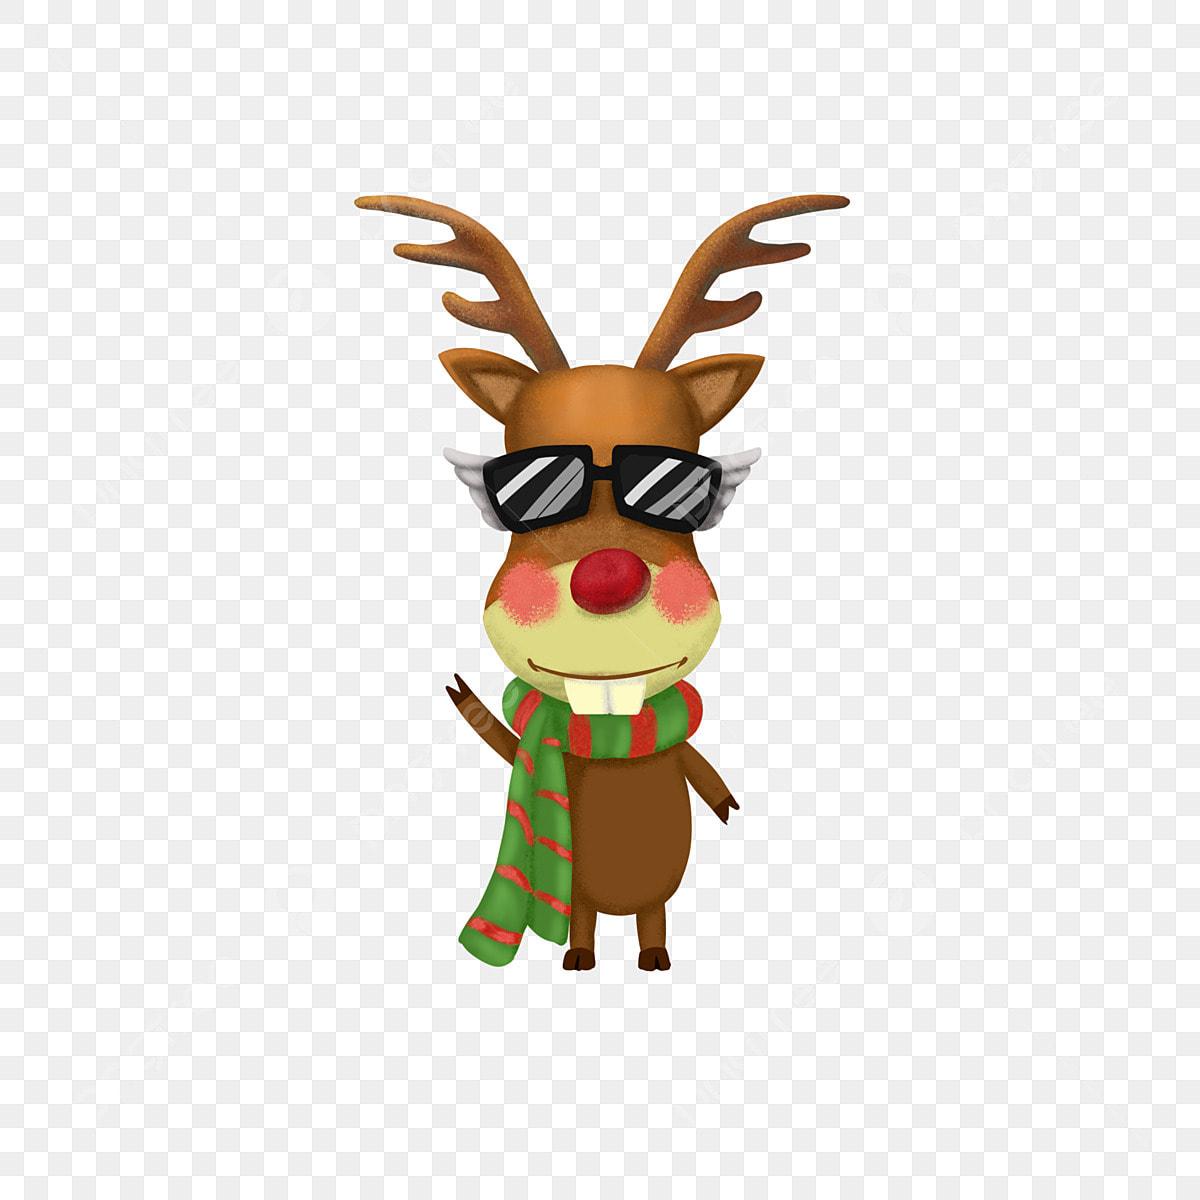 Christmas Humor Clip Art.Happy Christmas Funny Elk Image Christmas Festival Elk